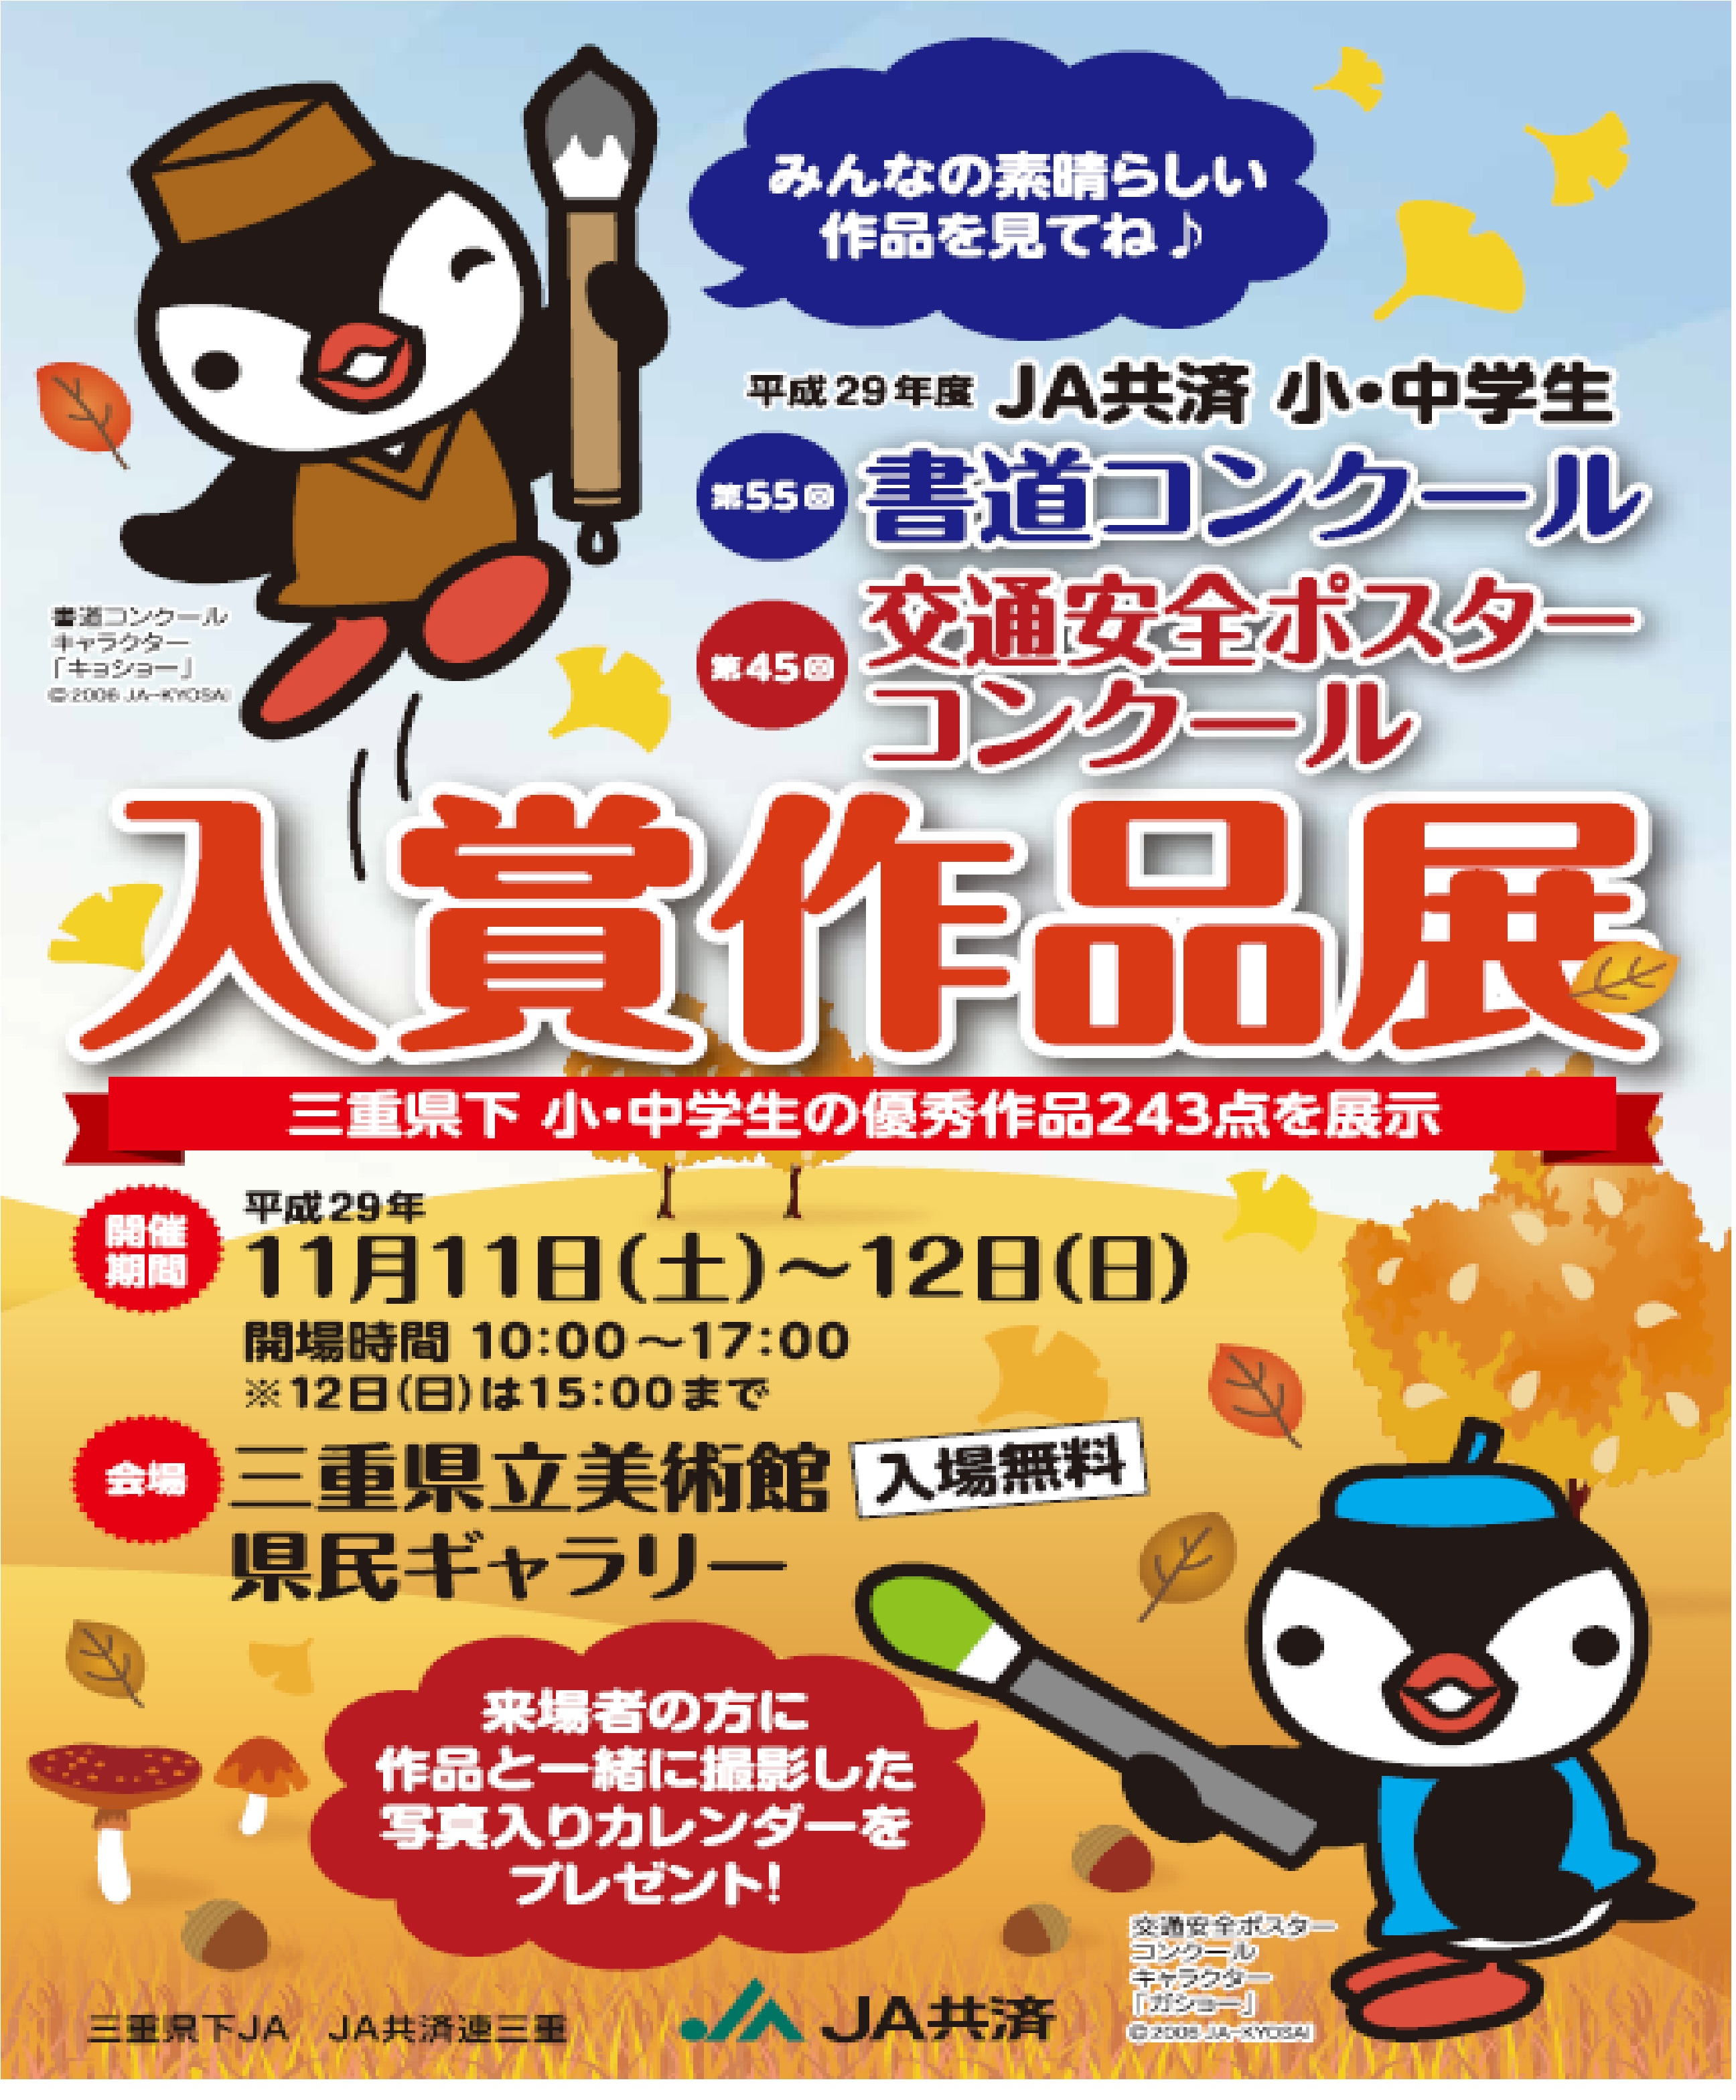 27.09.01 JA共済書道・交通安全ポスターコンクール入賞作品